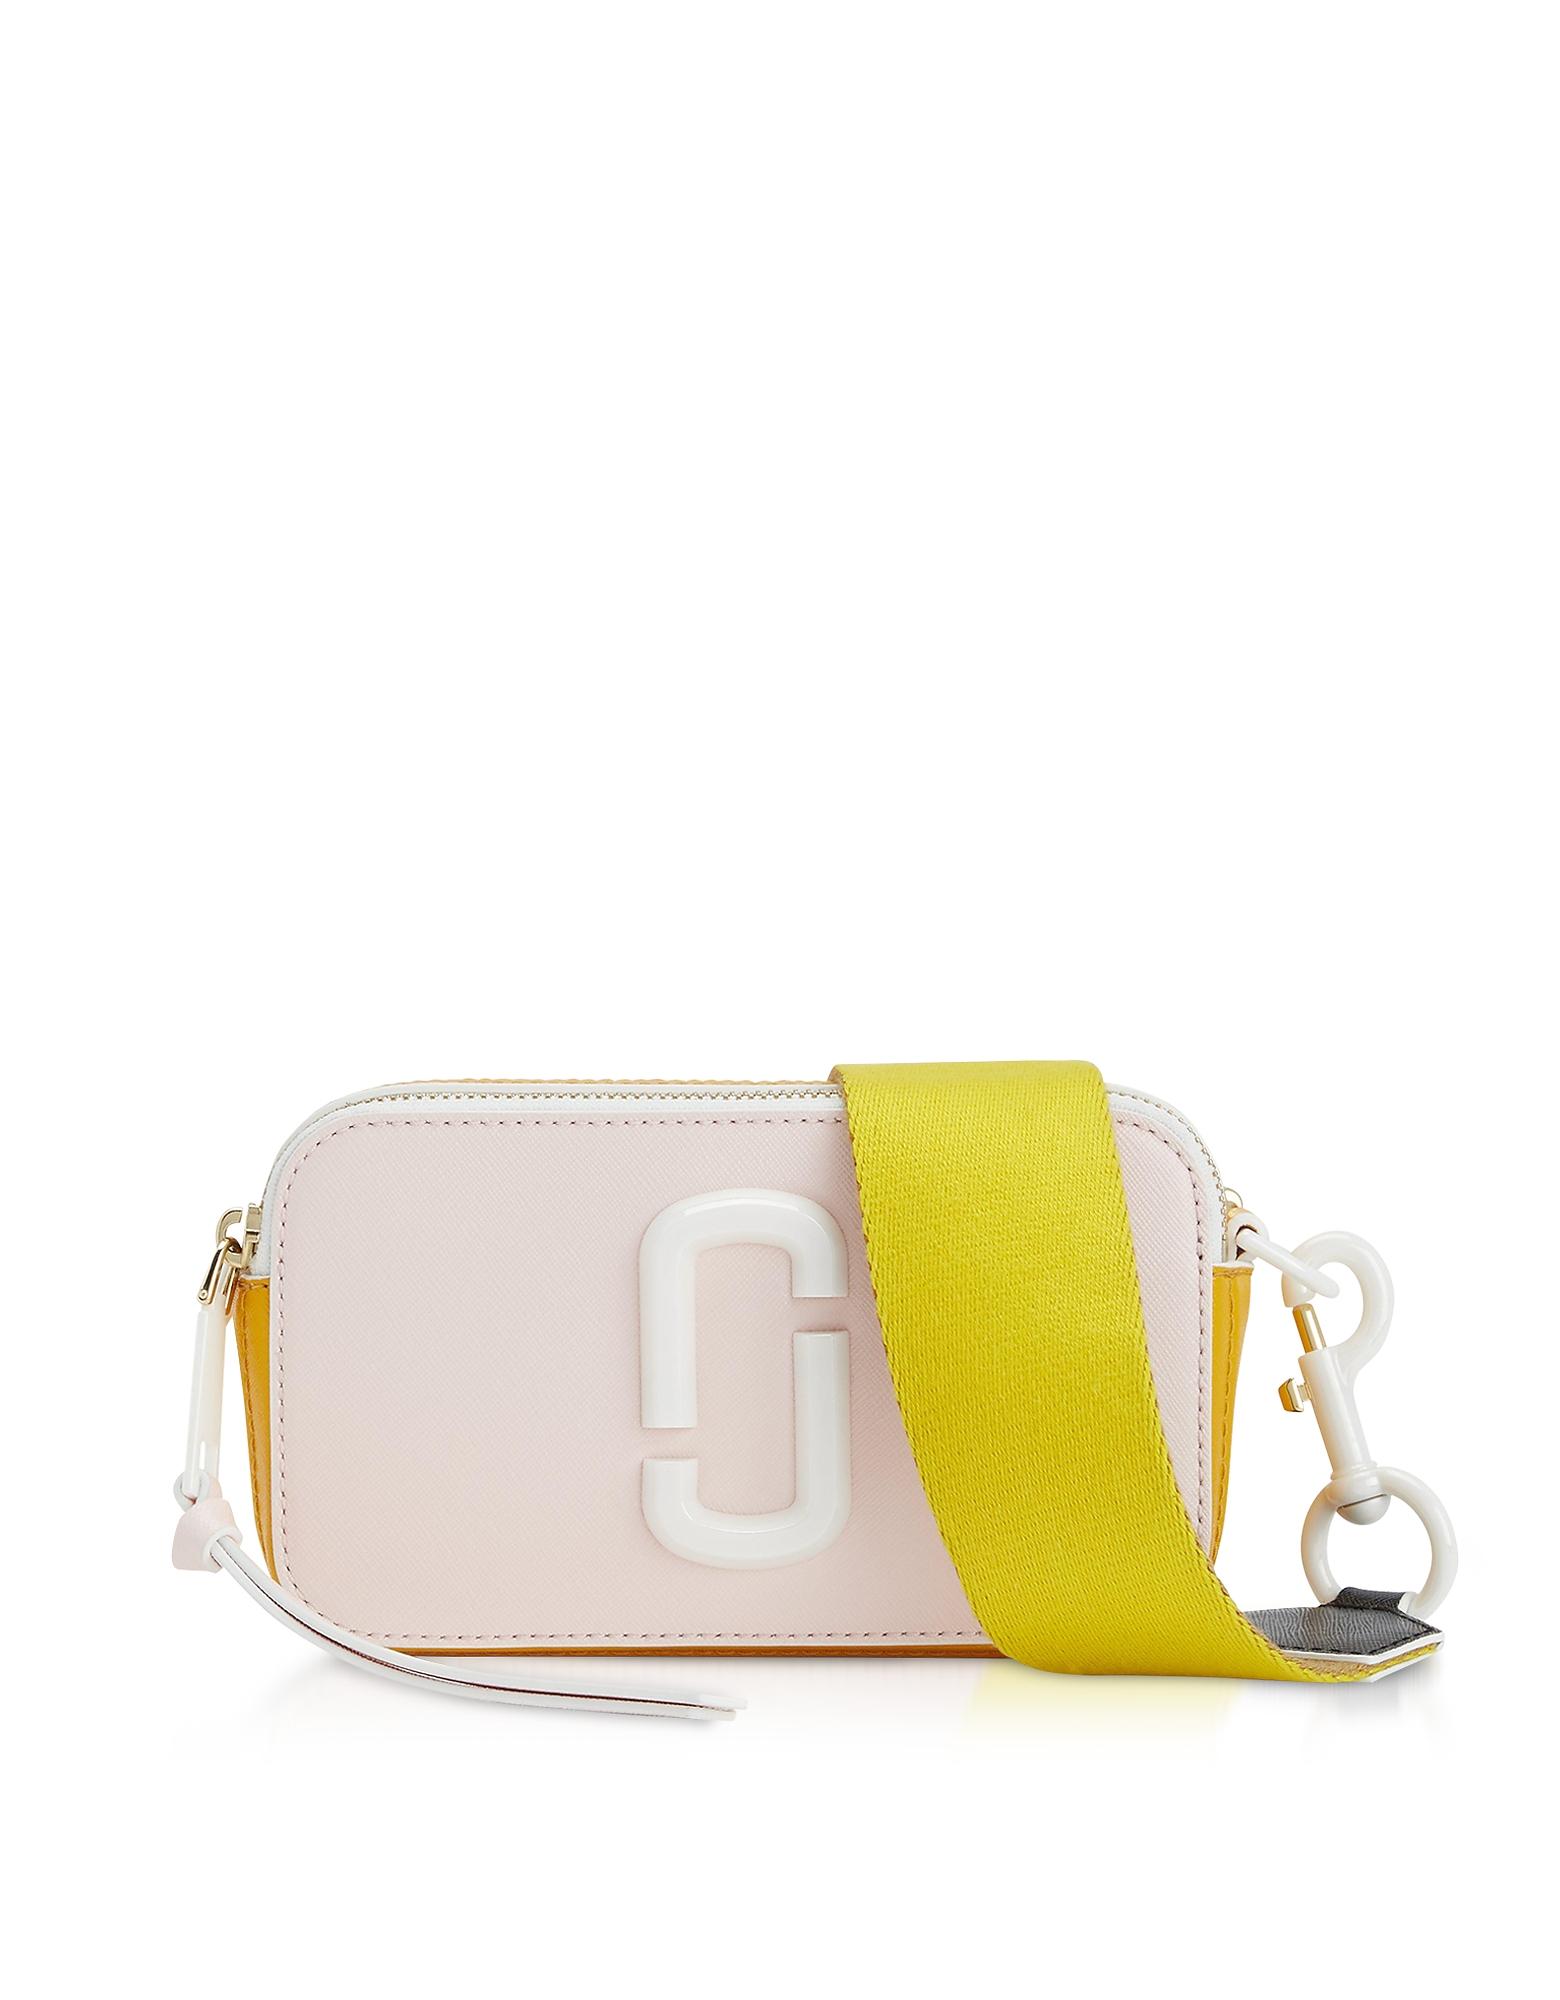 Marc Jacobs Bags CERAMIC SNAPSHOT SMALL CAMERA BAG